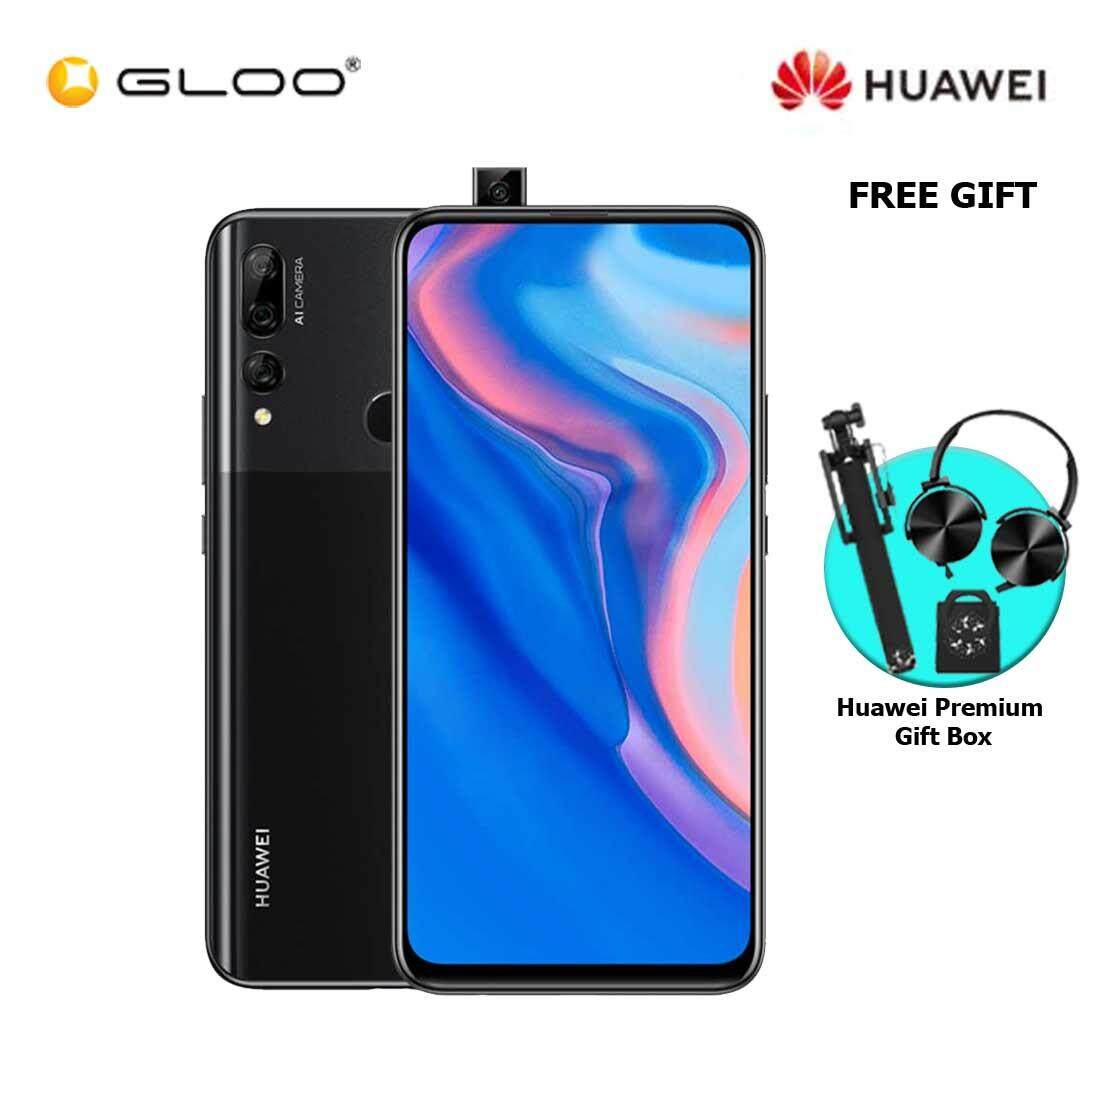 Huawei Y9 Prime 2019 4GB+128GB Midnight Black + FREE Premium Gift Box (Headset/Selfie Stick/iRing)